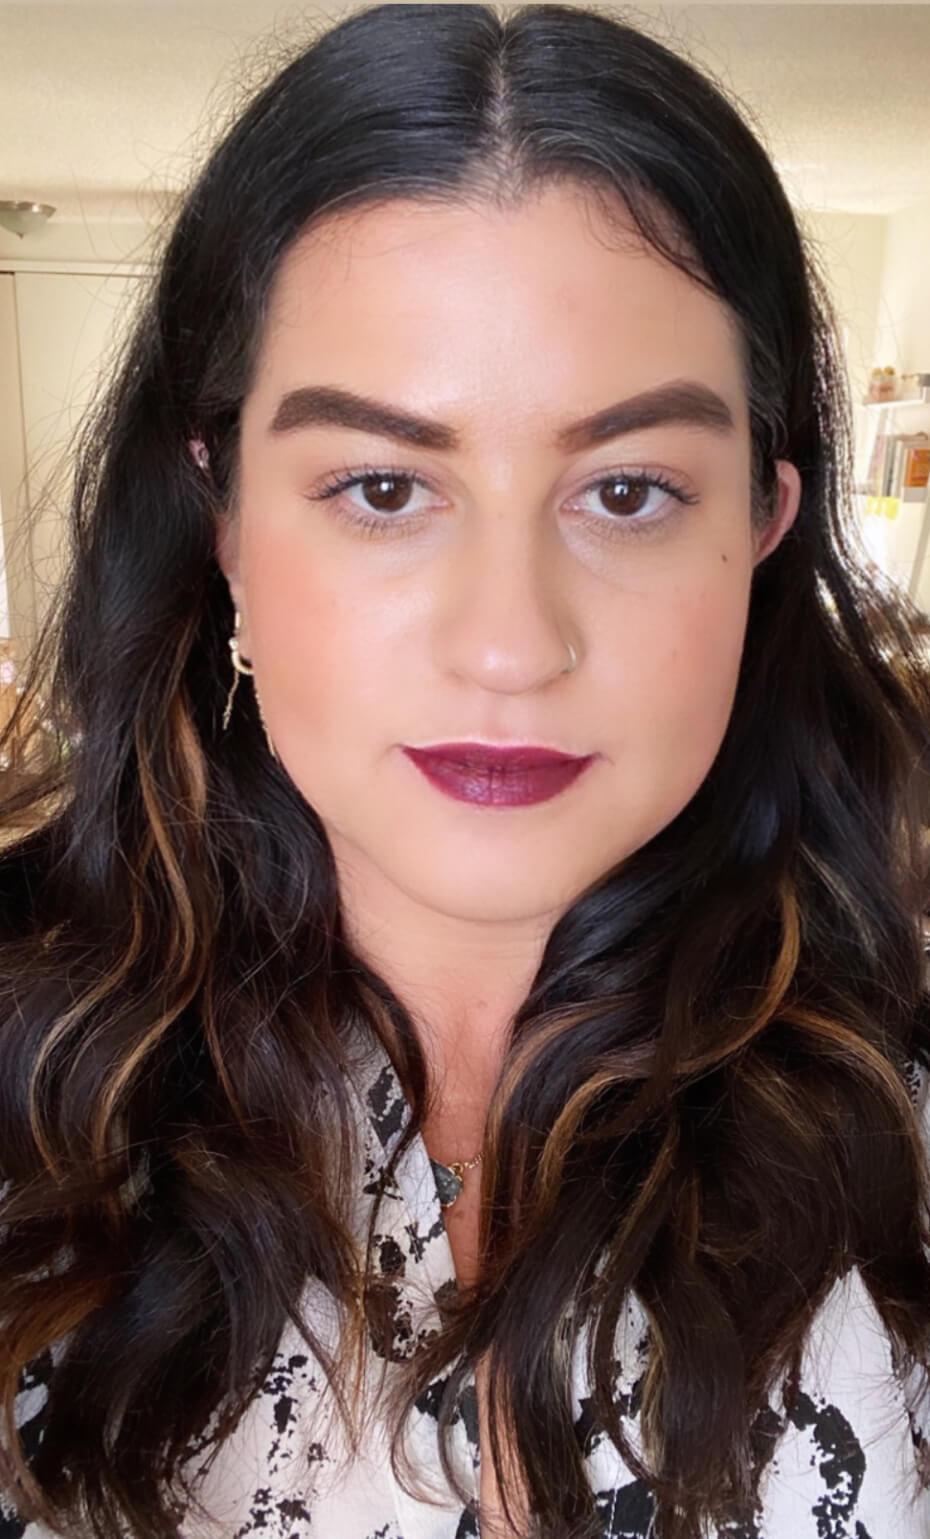 lipstick-shiseido-dark-fantasy-072920-1